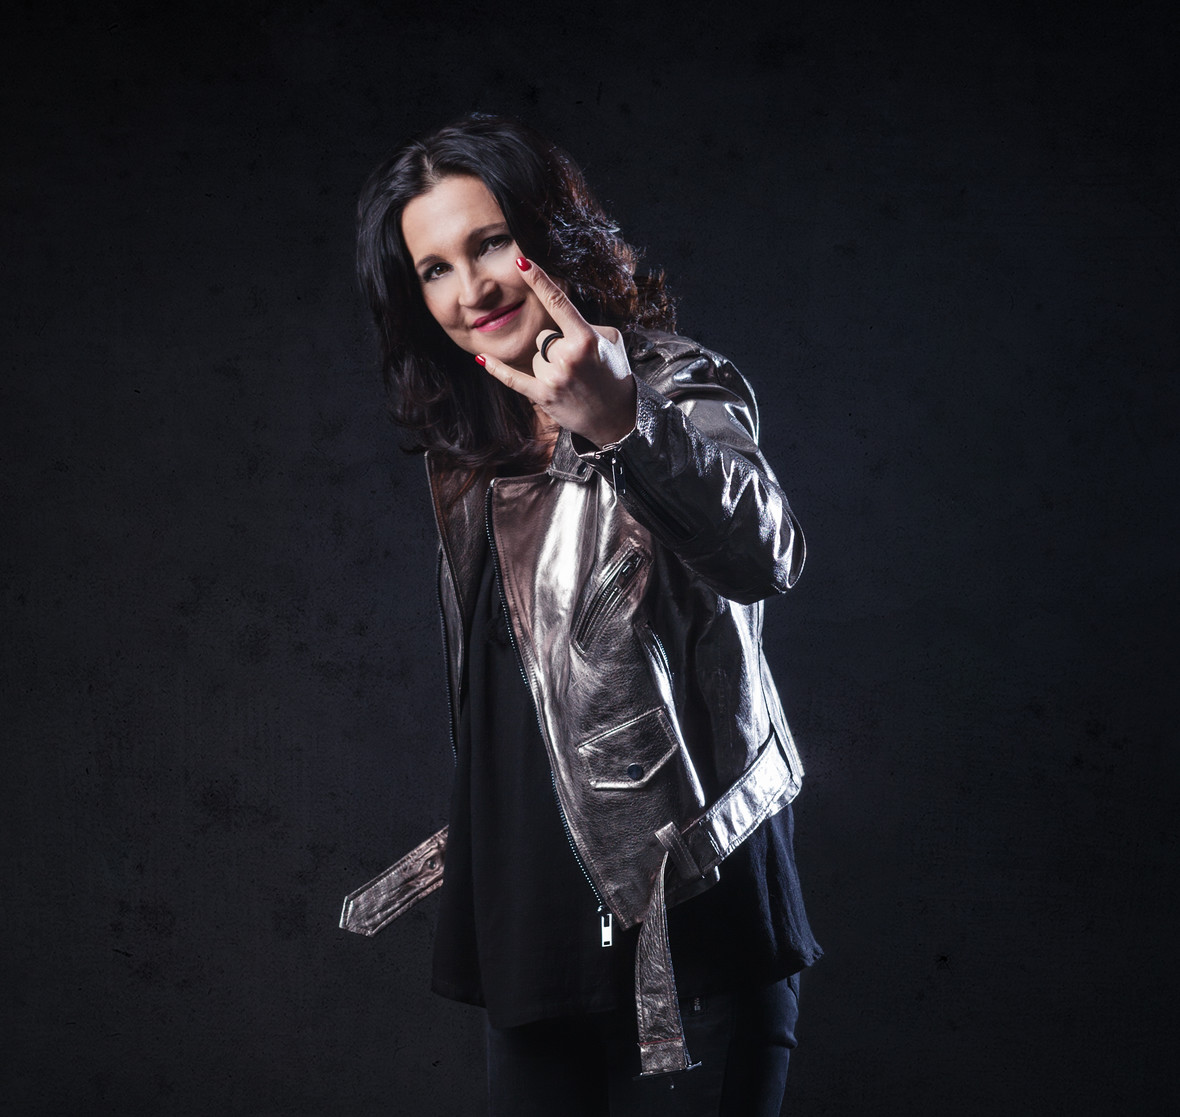 Joanna Zientarska